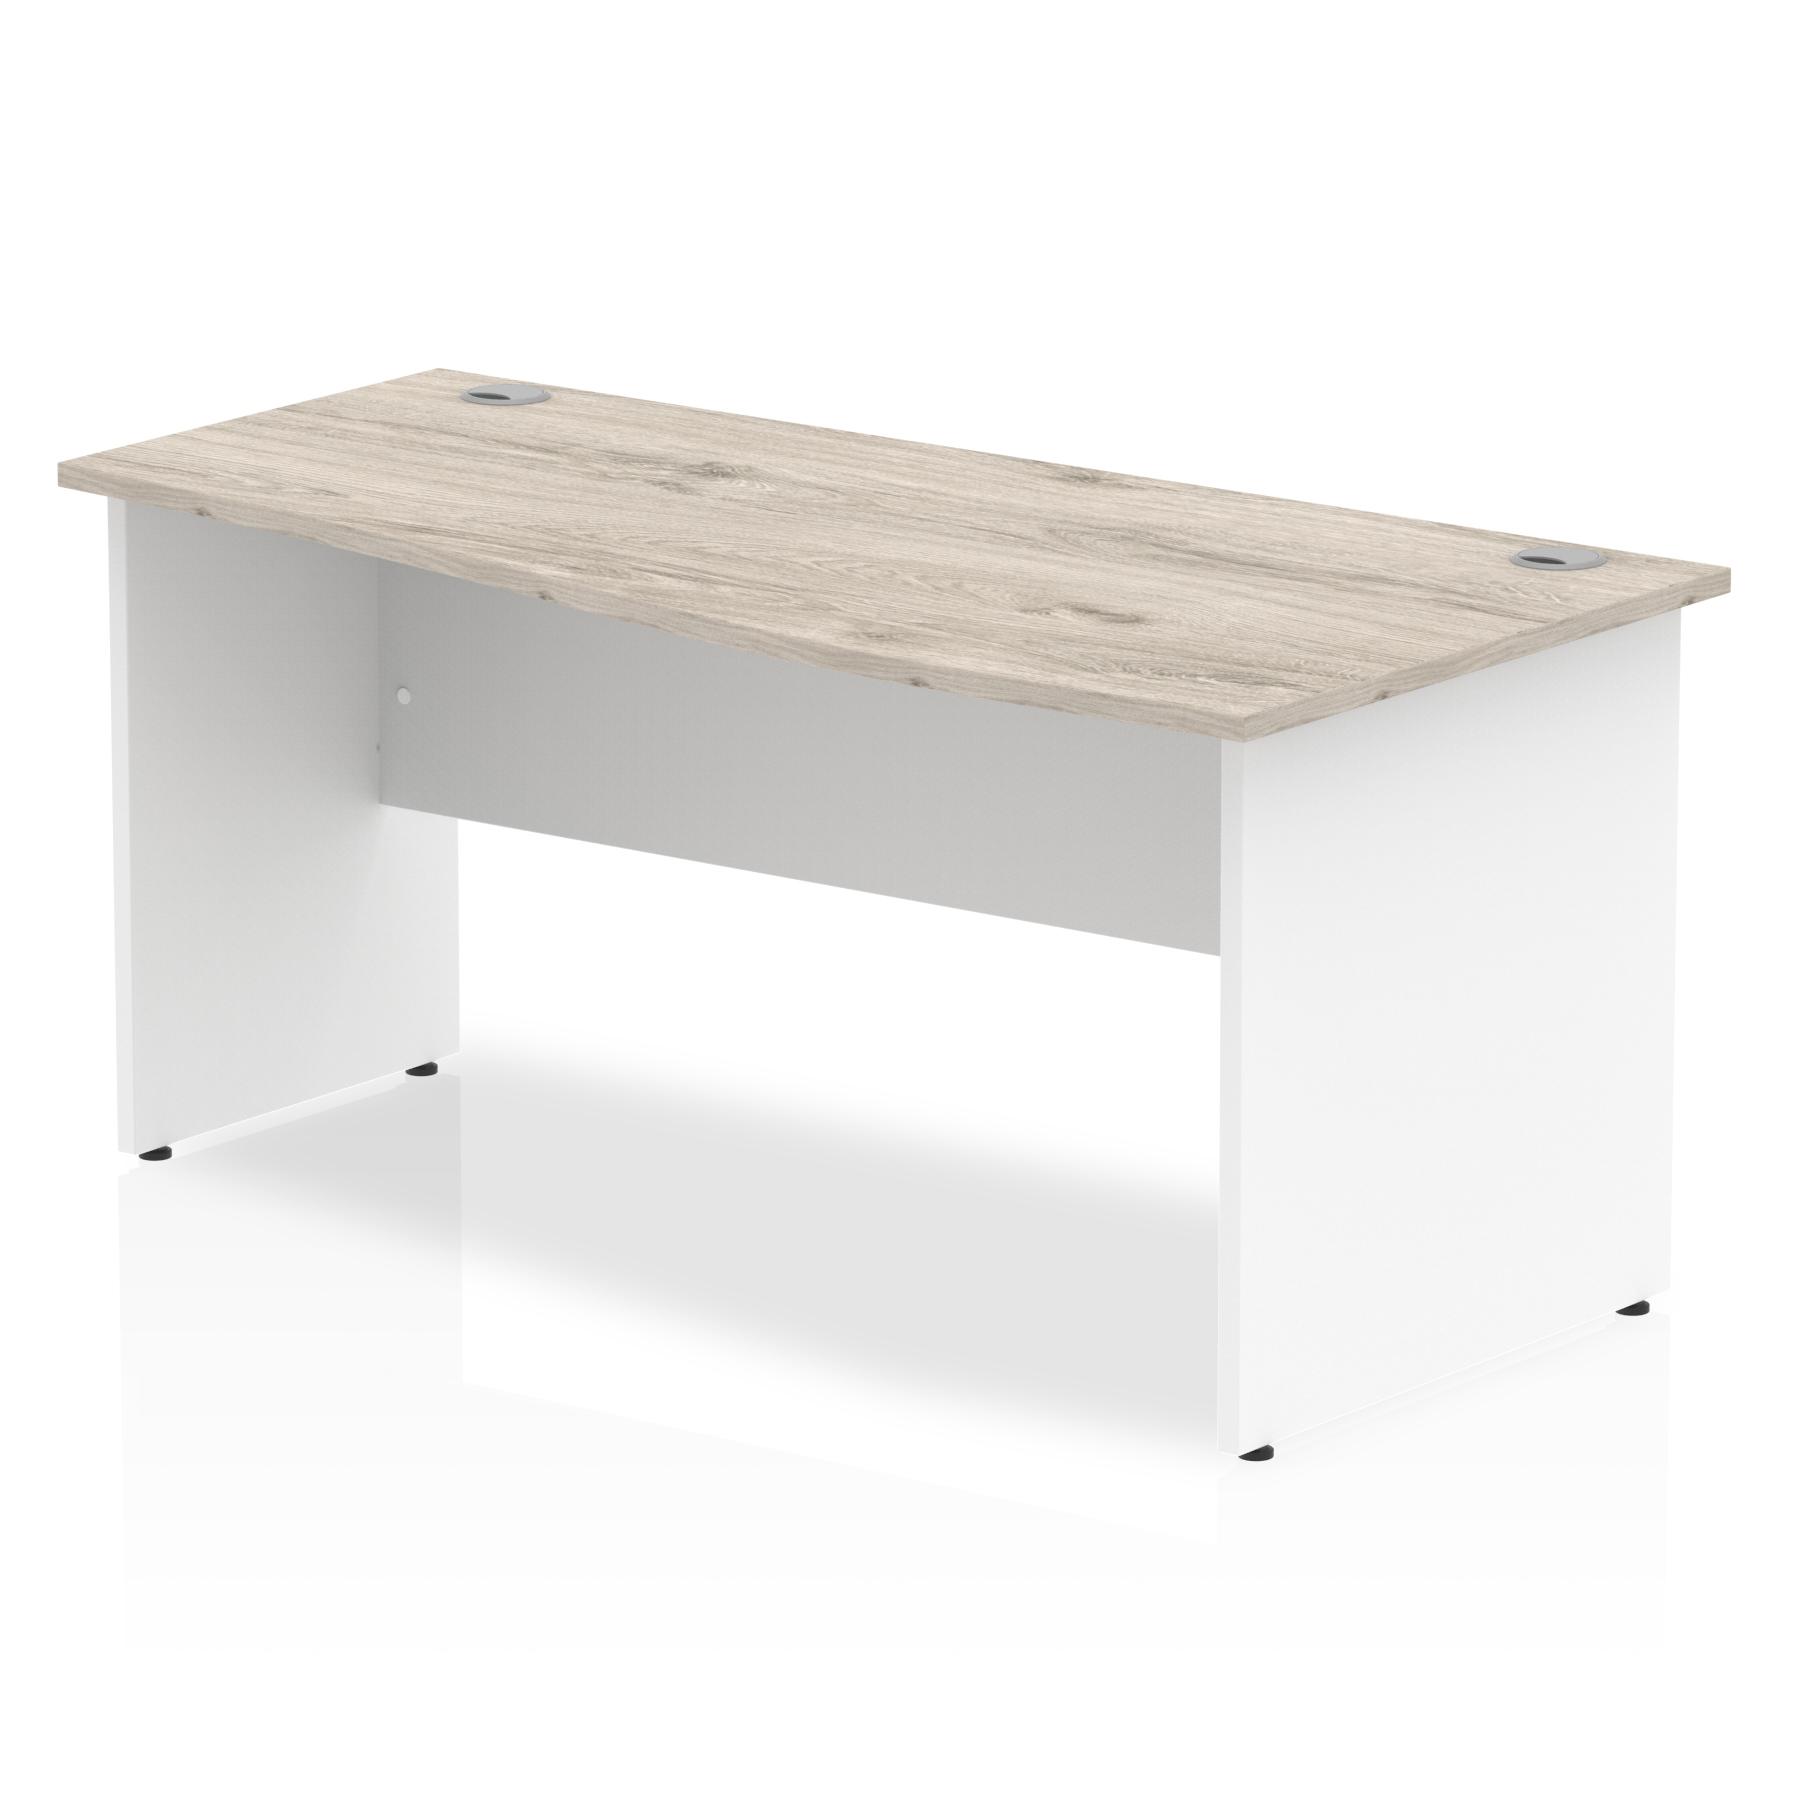 Trexus Wave Desk Right Hand Panel Leg 1600x1000/800x730mm Grey Oak/White Ref TT000160